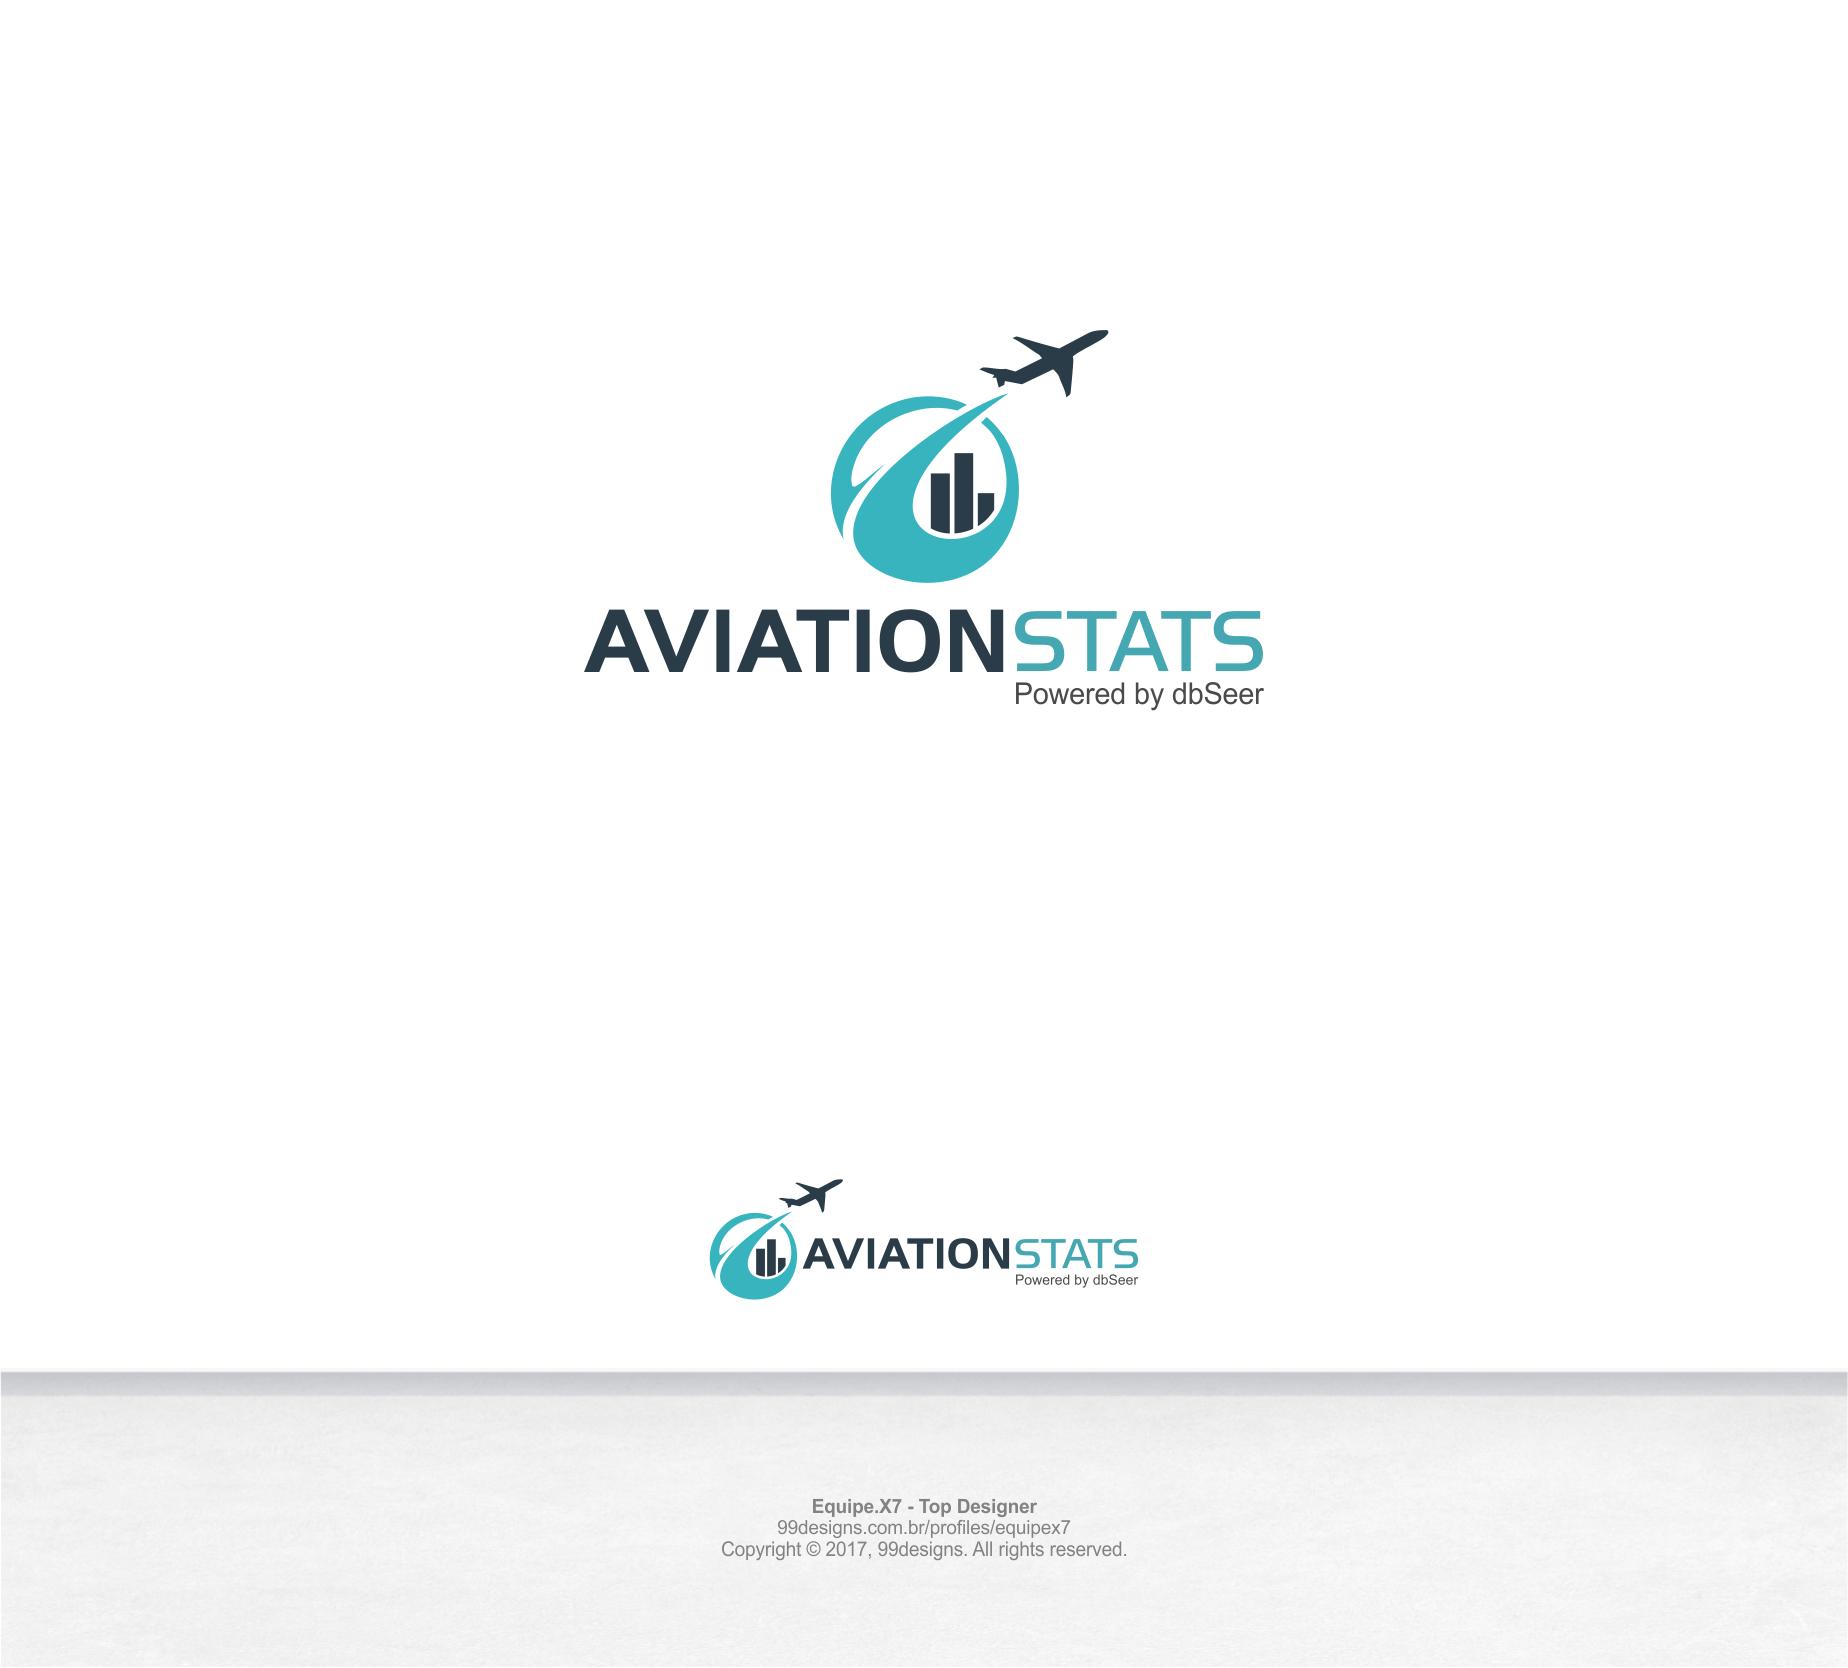 Aviation Stats Logo Design 99designs 99designs